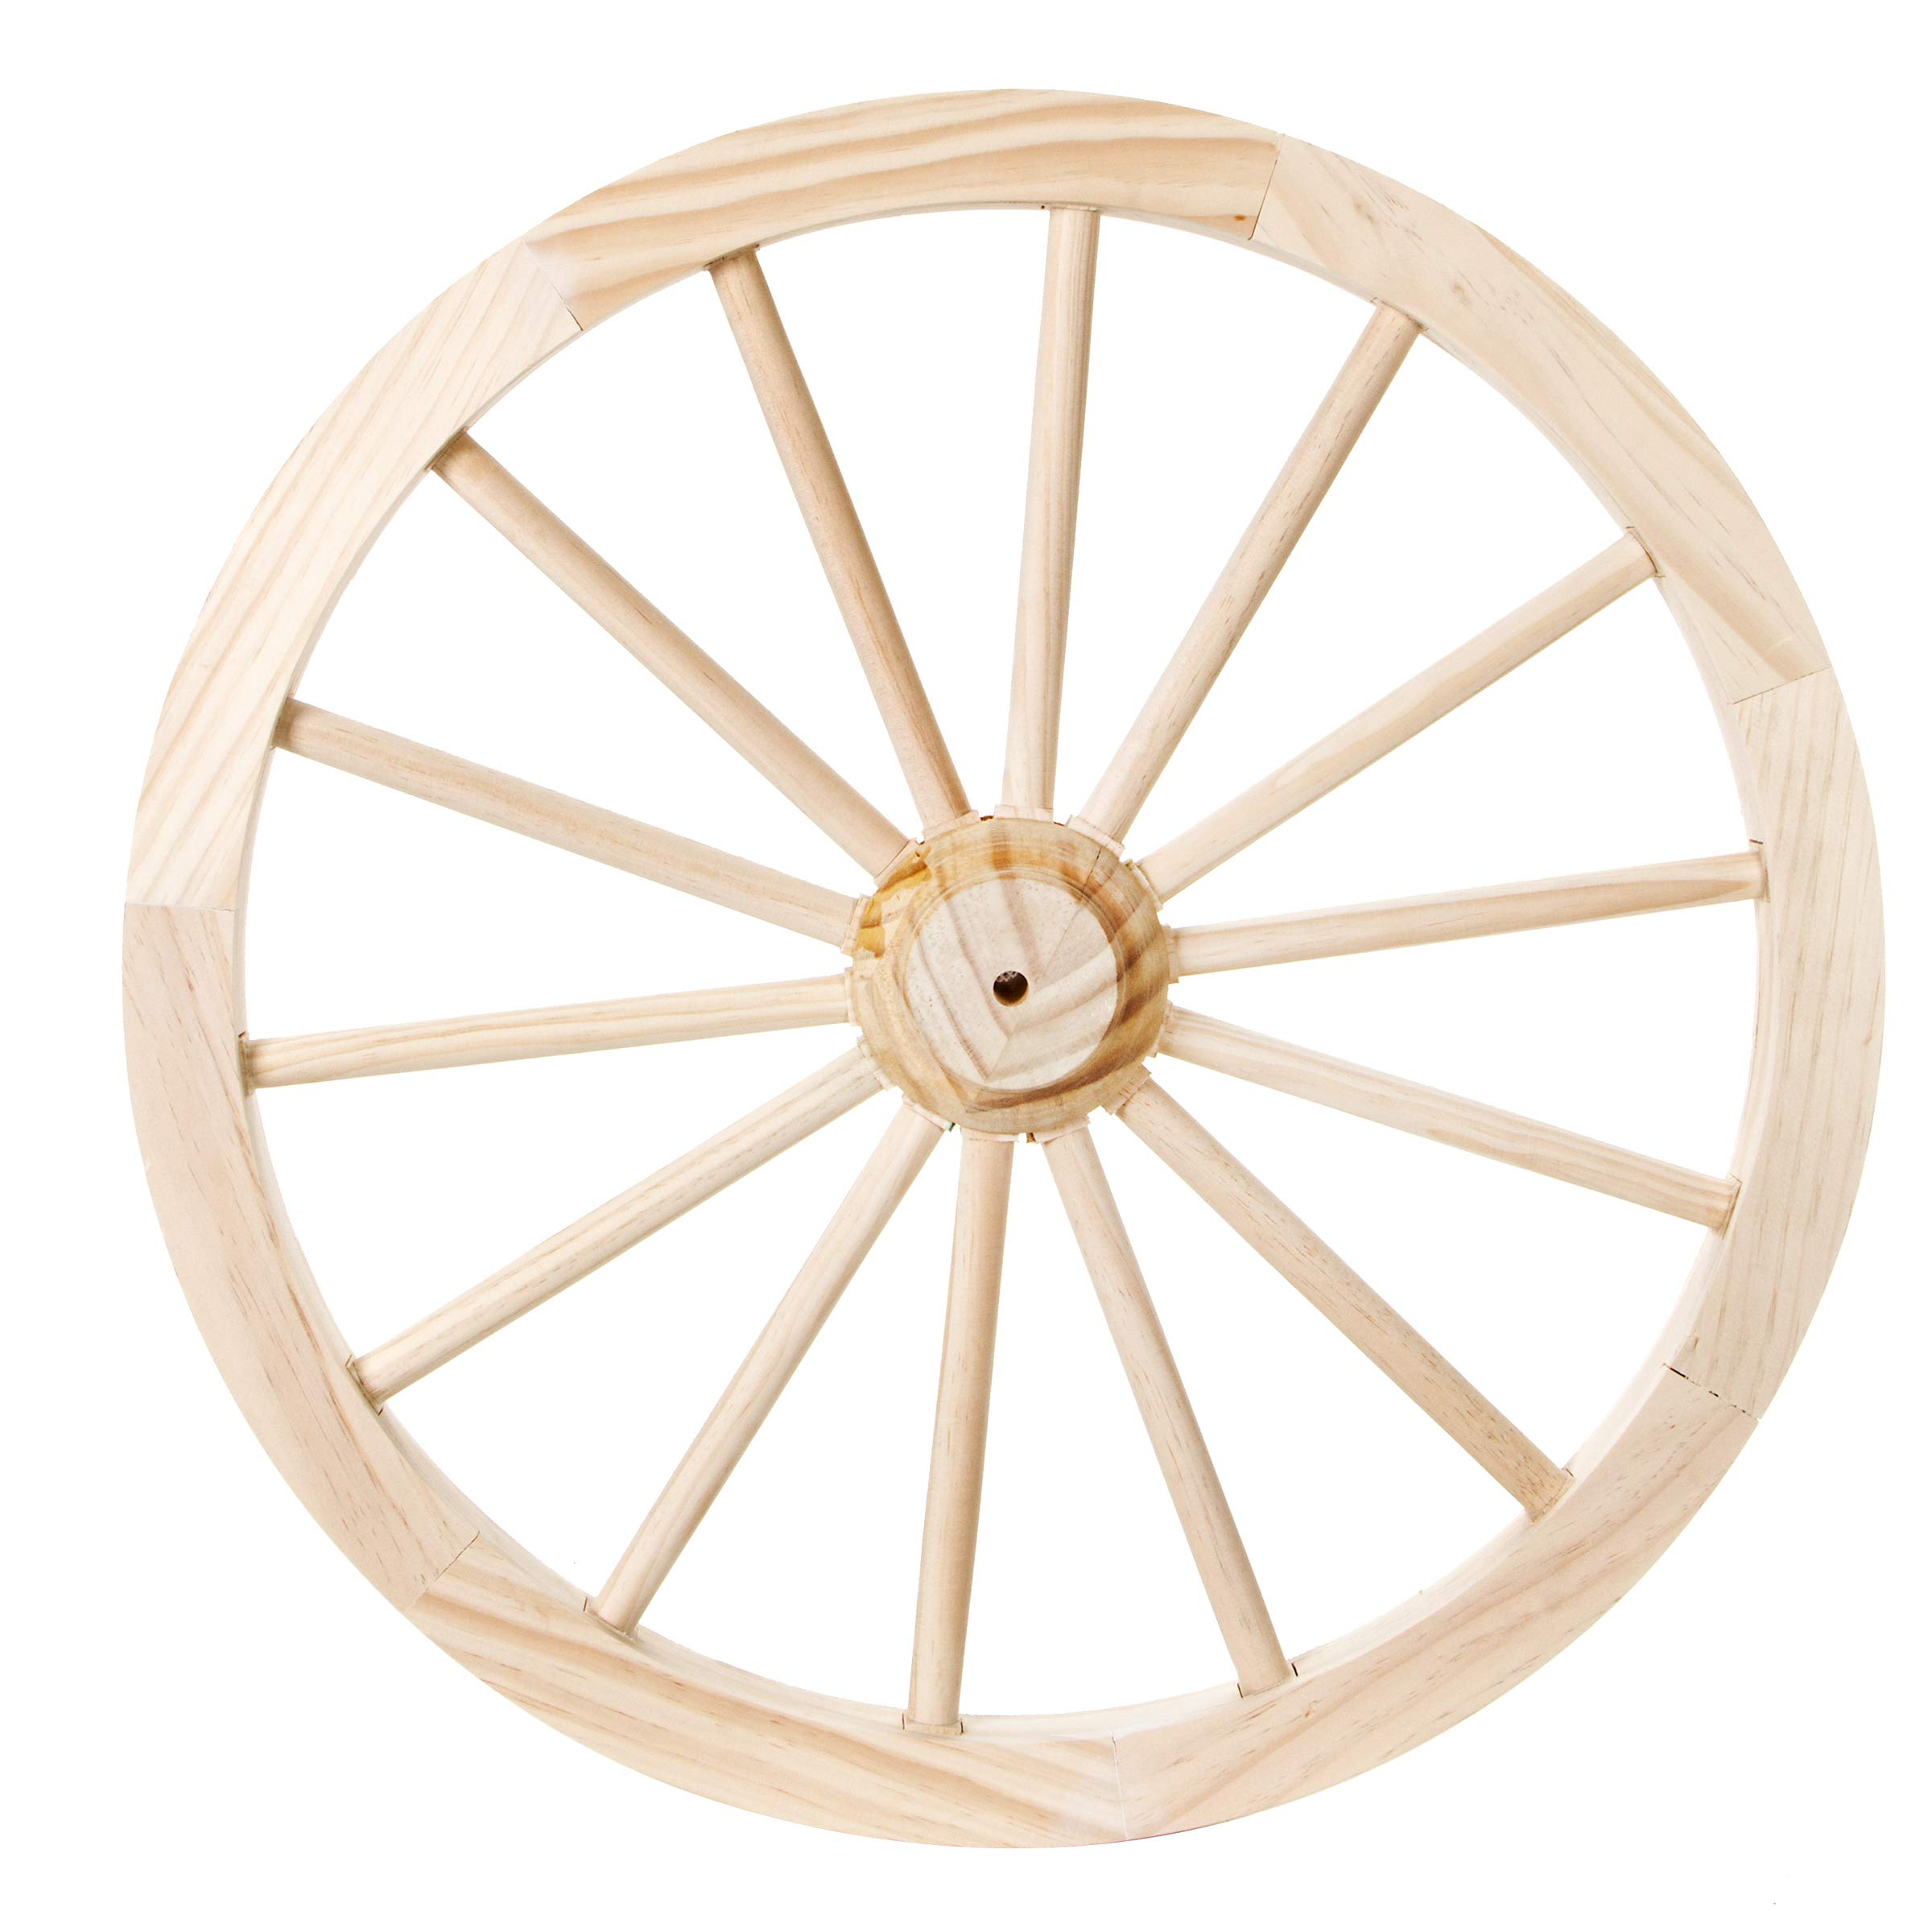 DARICE 9135-13 Unfinished Wood Decorative Wagon Wheel: 23.5 inches